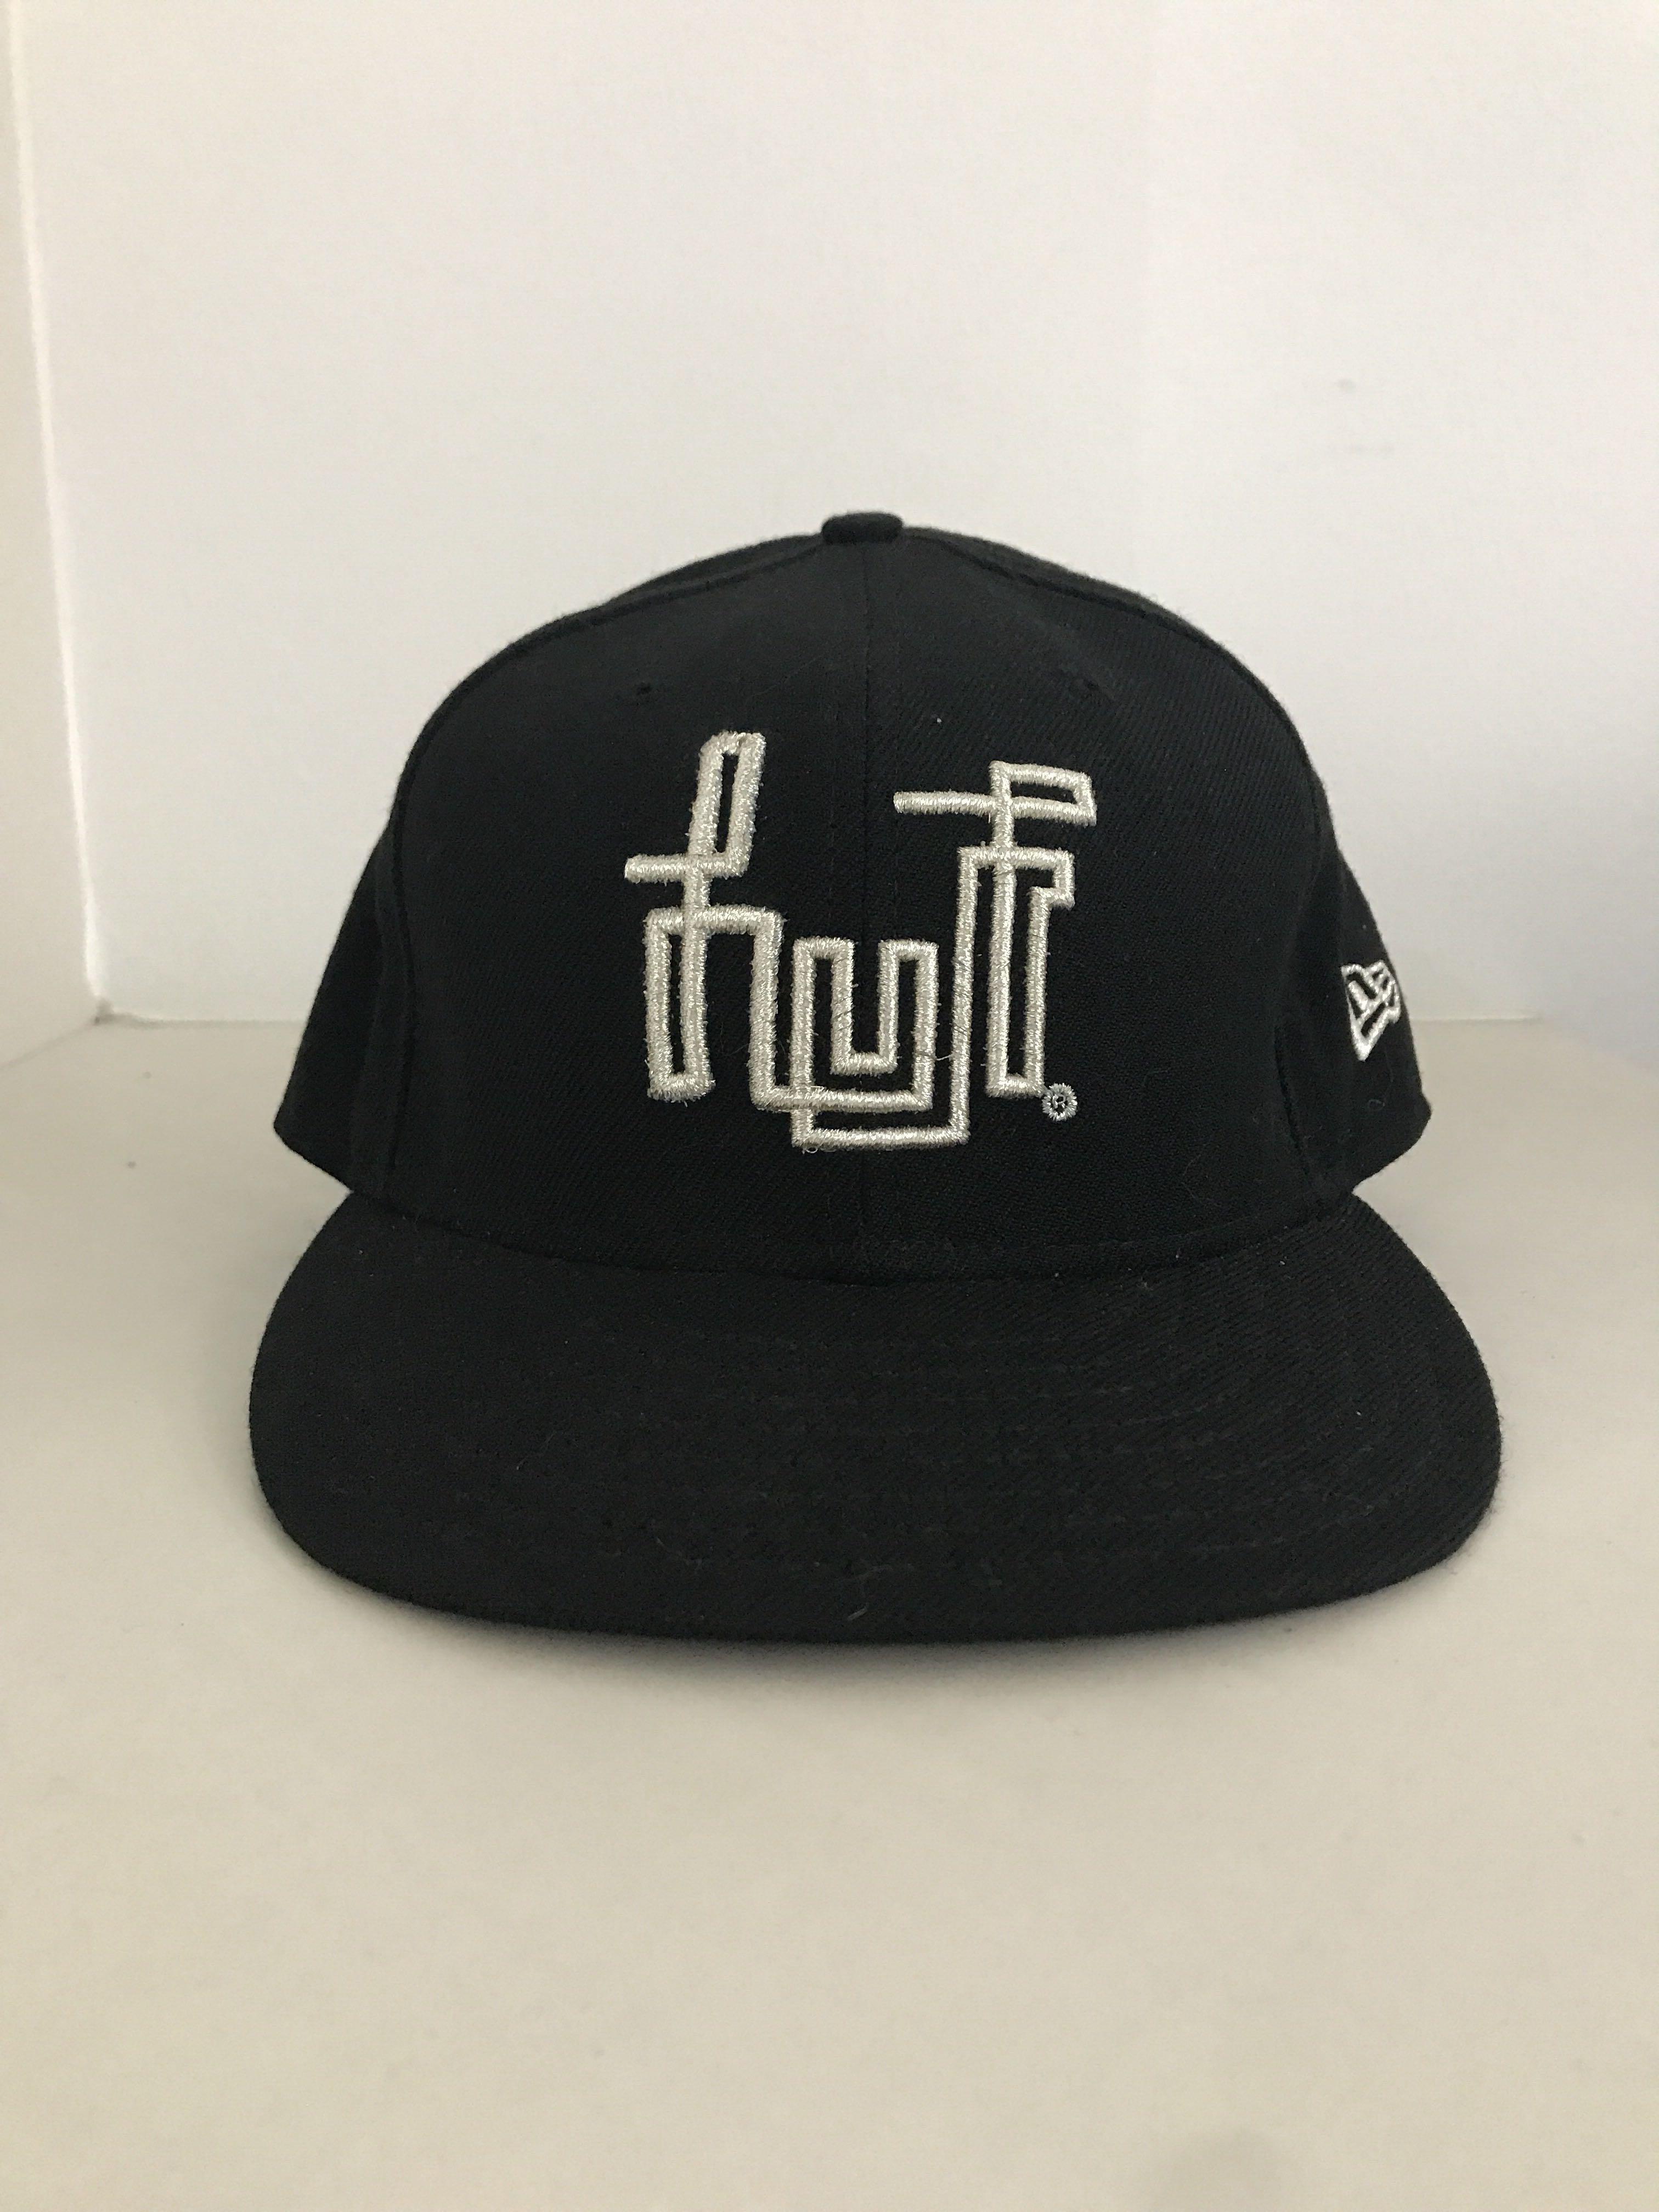 5bee9ba4775 ... Hats. photo photo photo photo photo